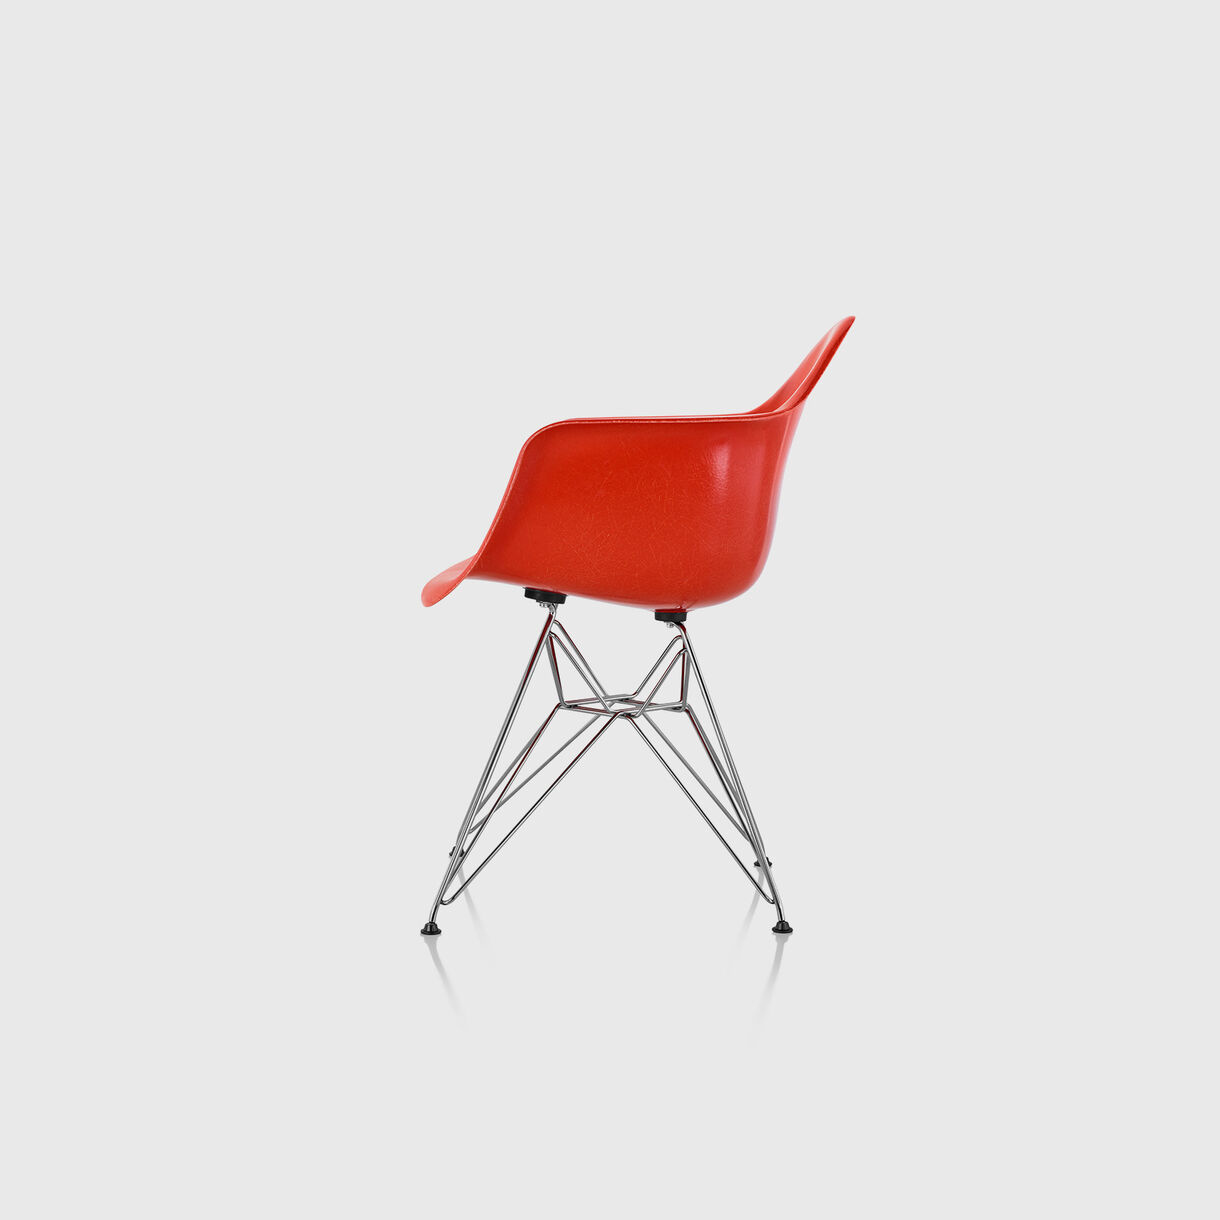 Eames Moulded Fibreglass Armchair, Red Orange & Chrome